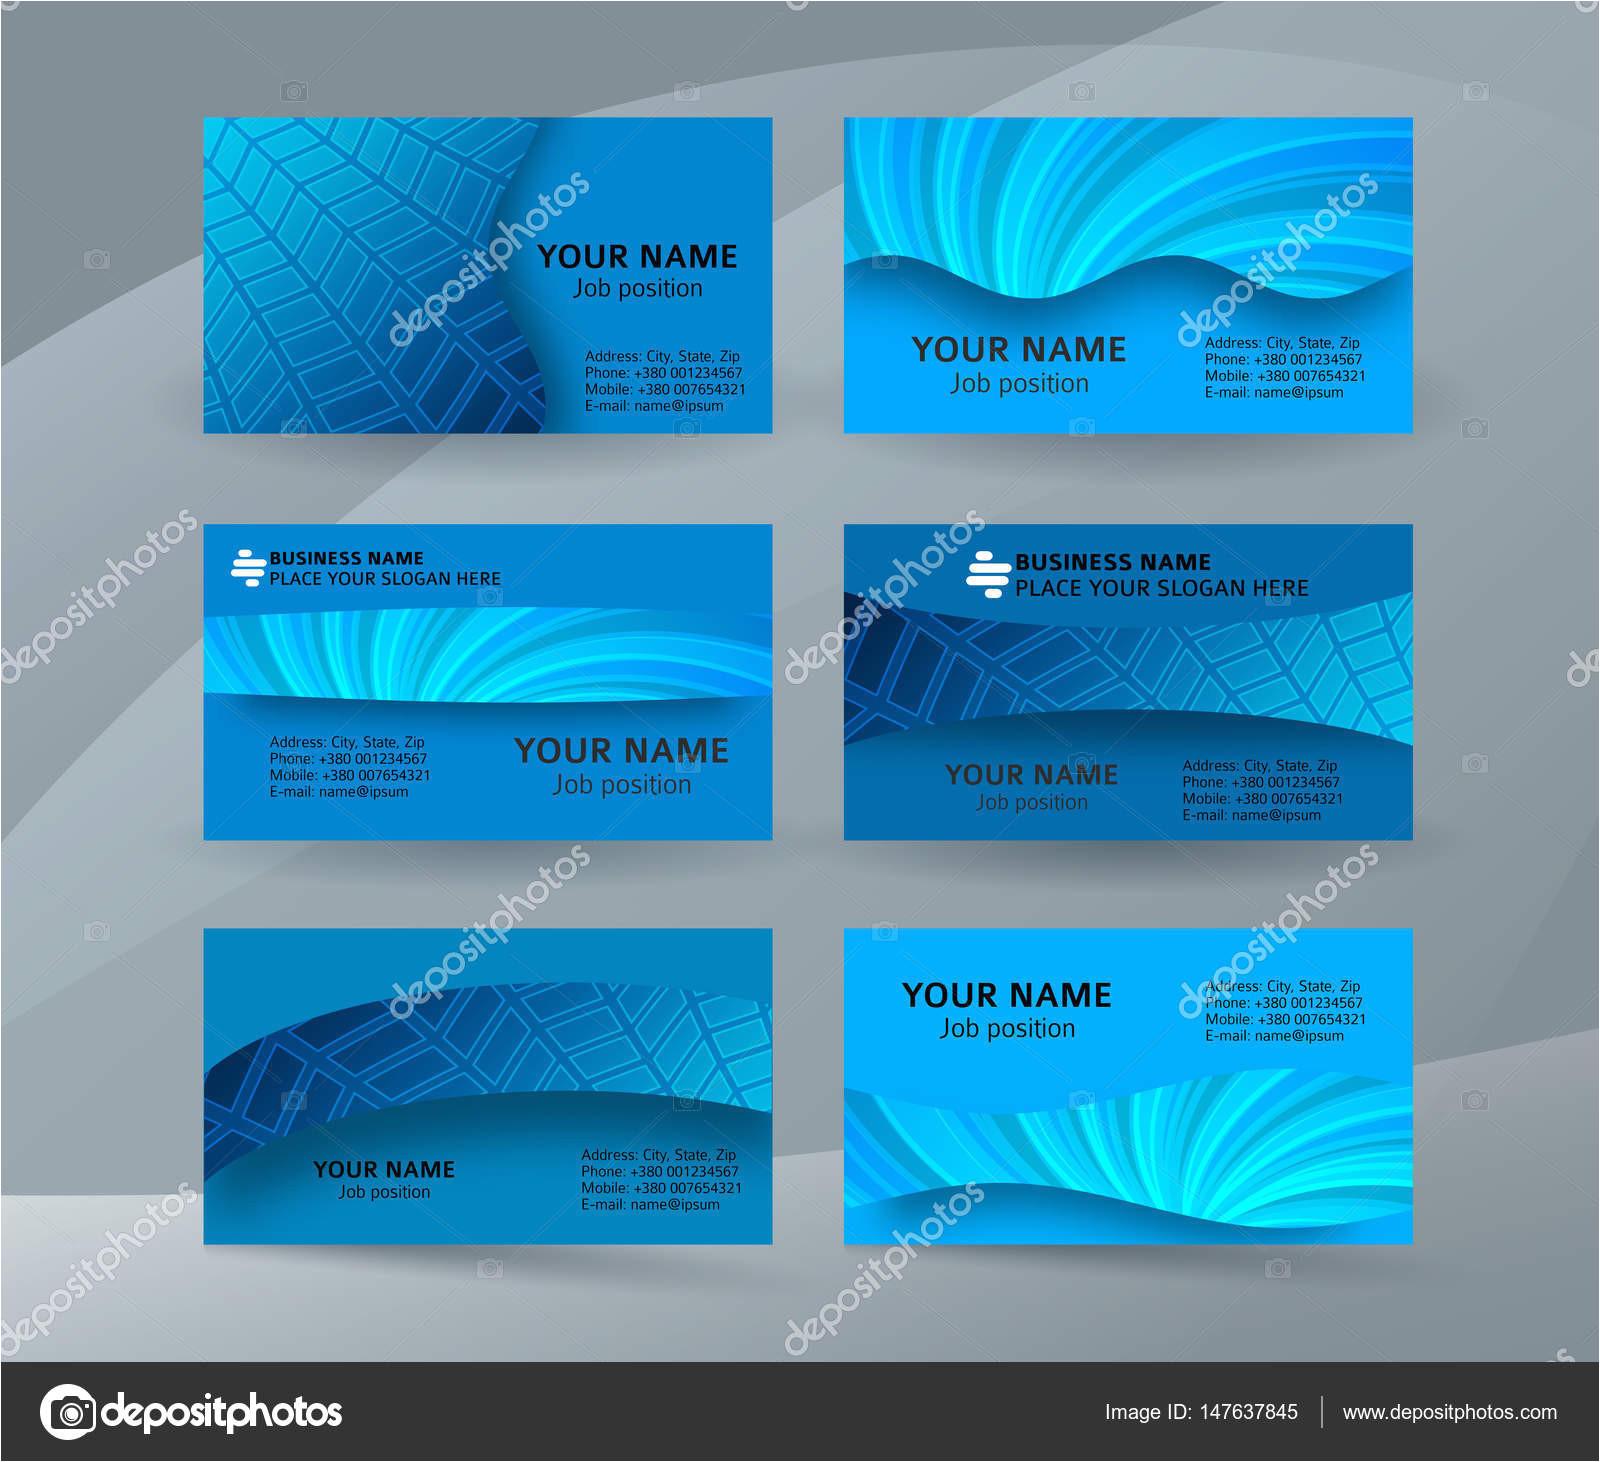 depositphotos 147637845 stock illustration business card background blue set jpg